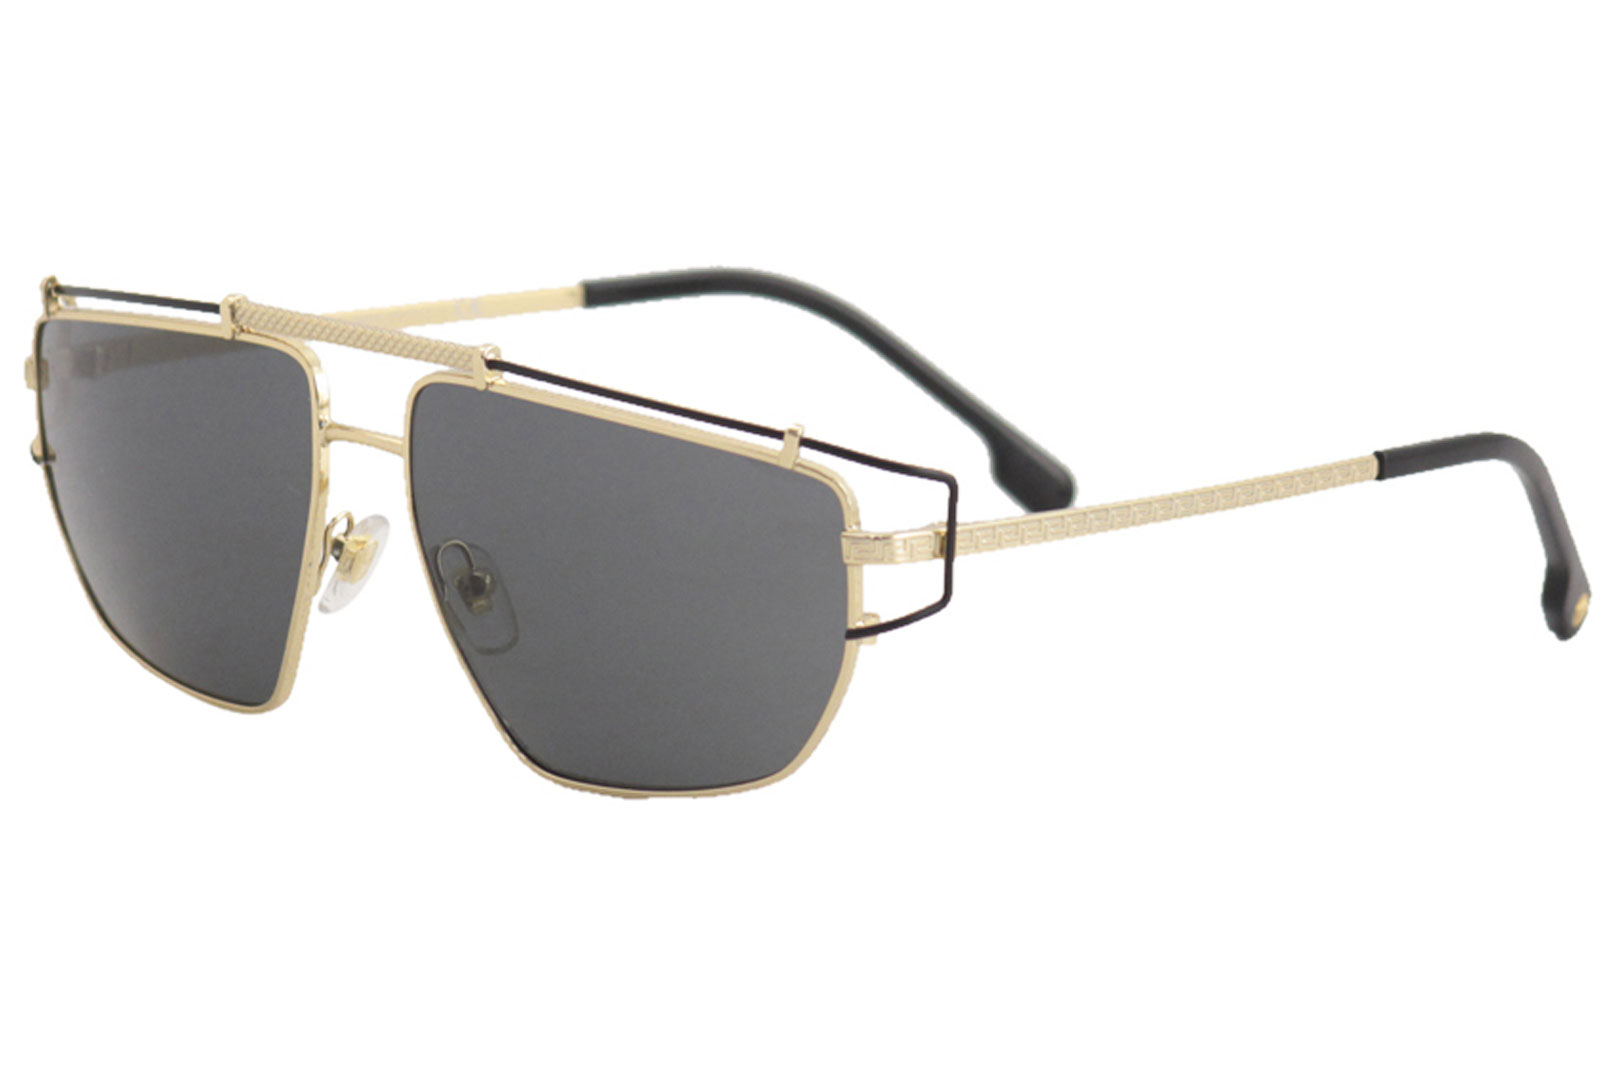 5eef8be14b73 Versace Men s VE2202 VE 2202 1436 87 Gold Fashion Pilot Sunglasses ...